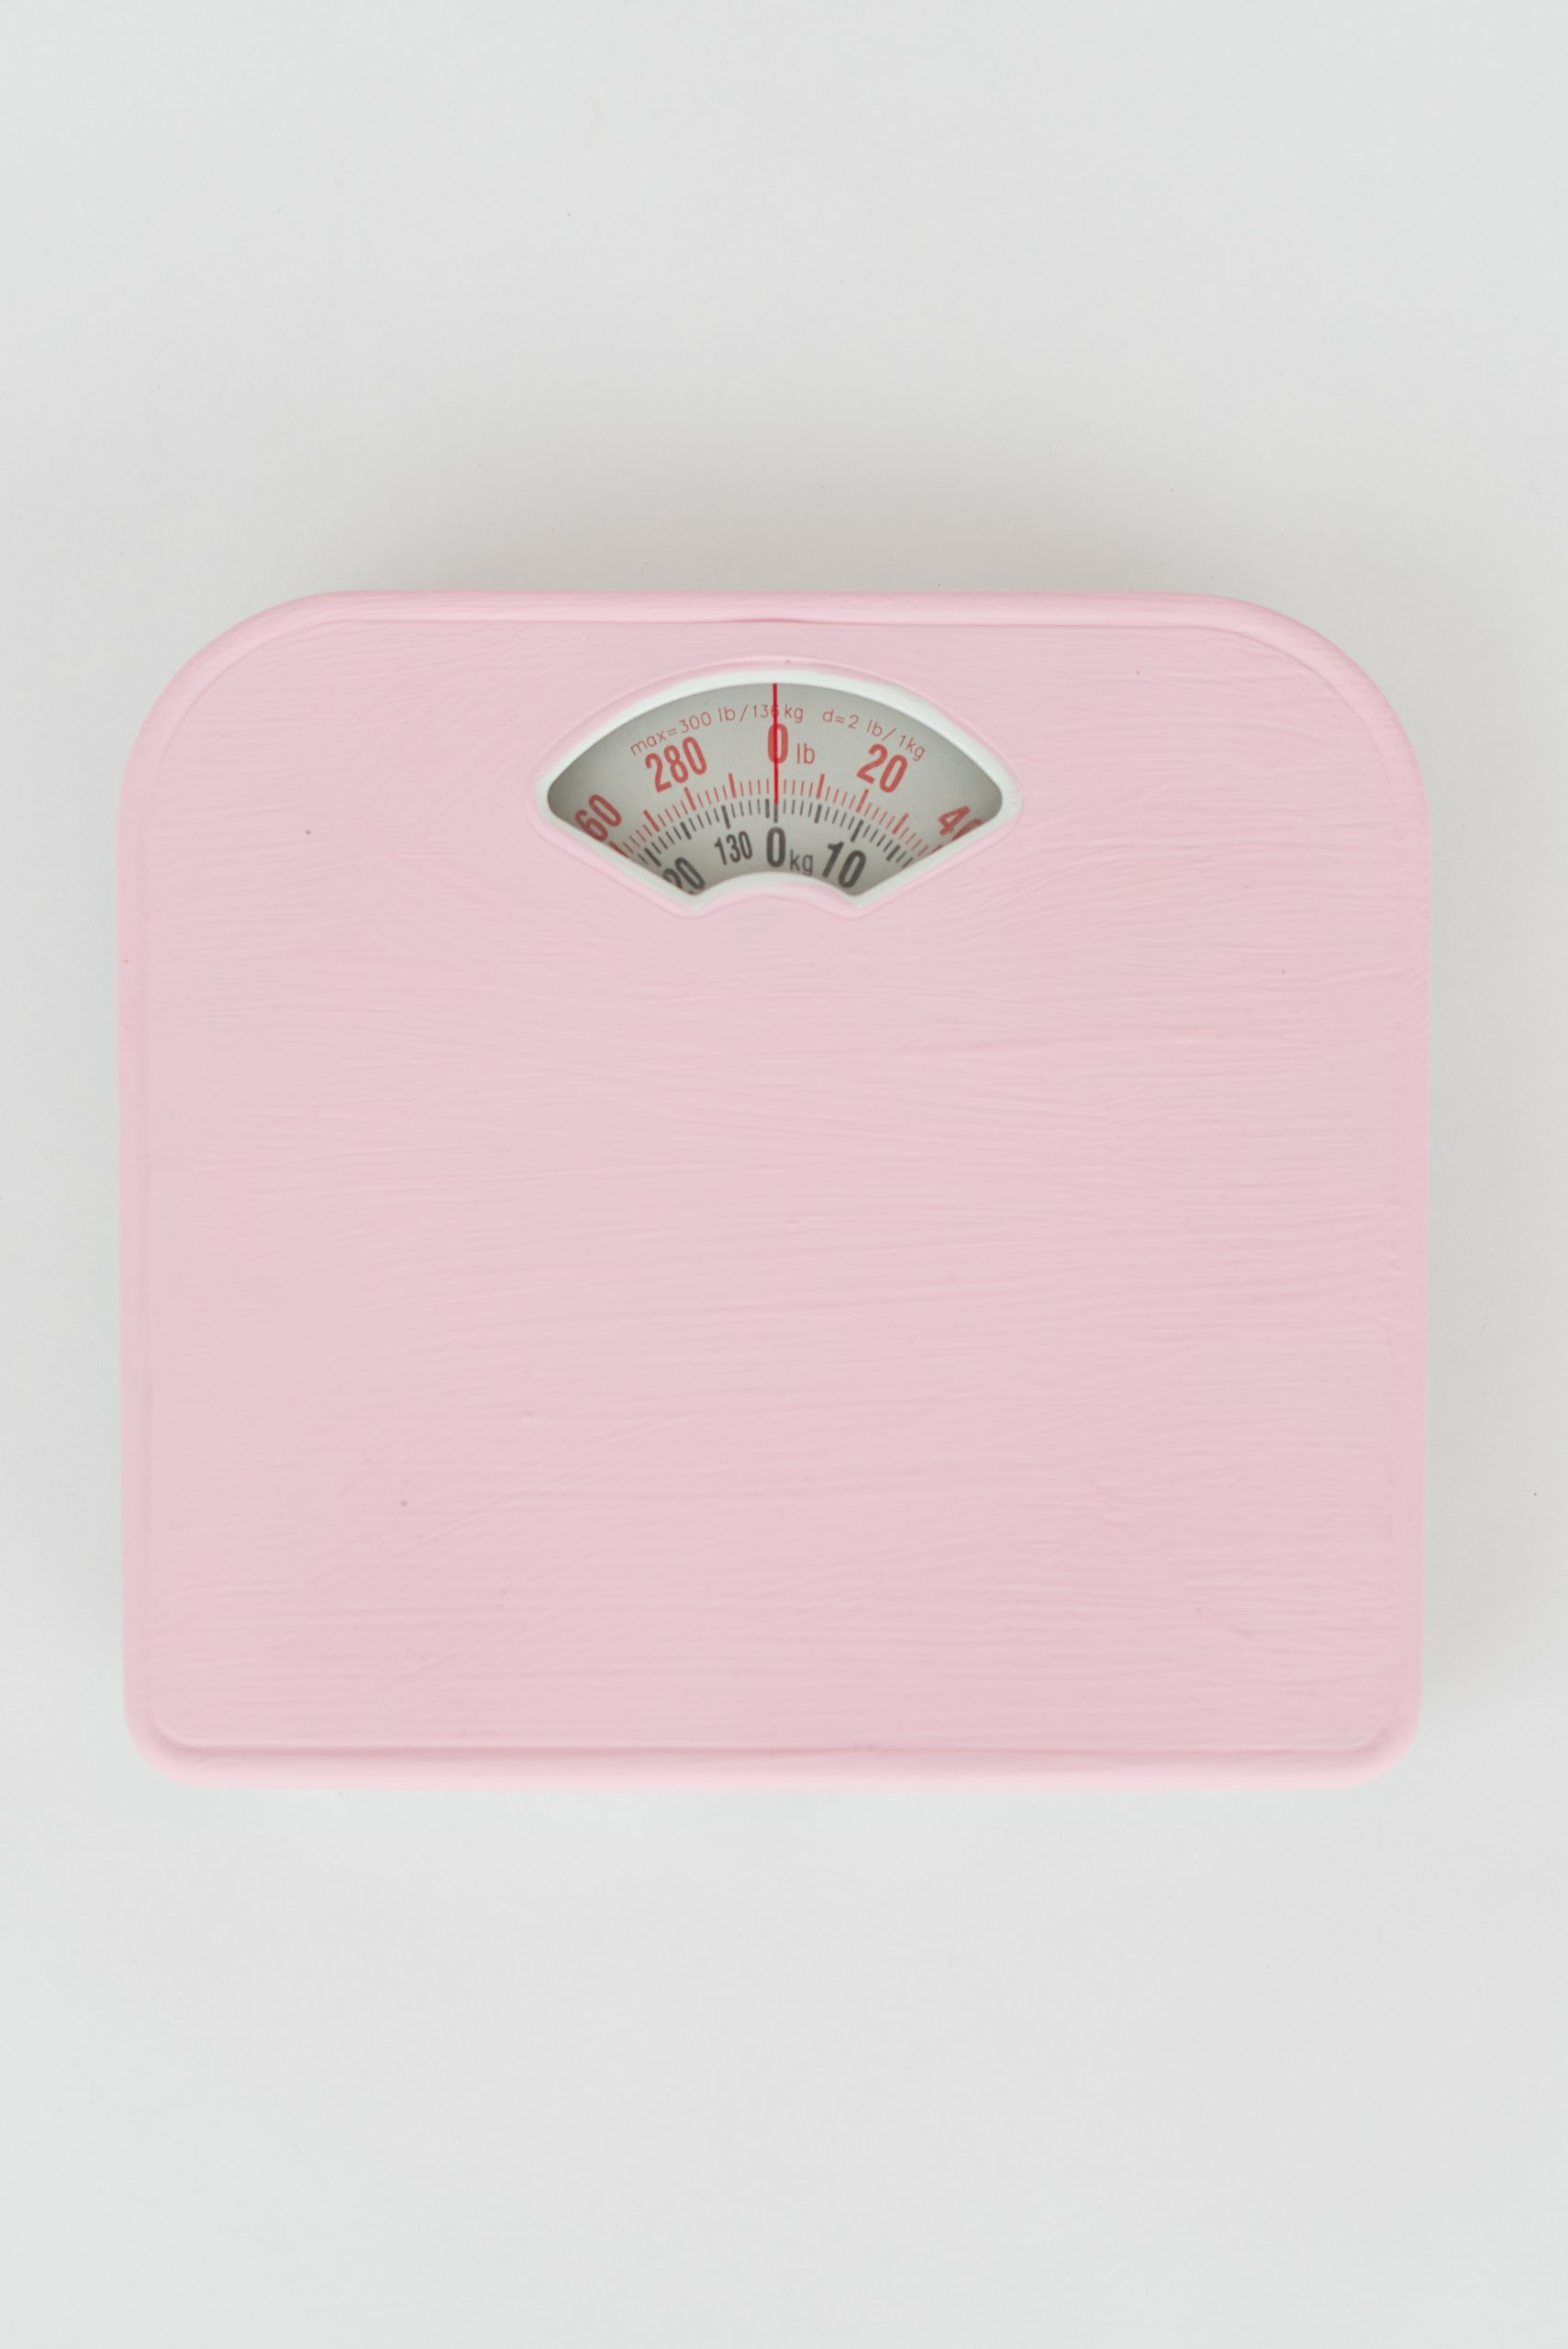 Dormir: o segredo para comer menos e perder peso?